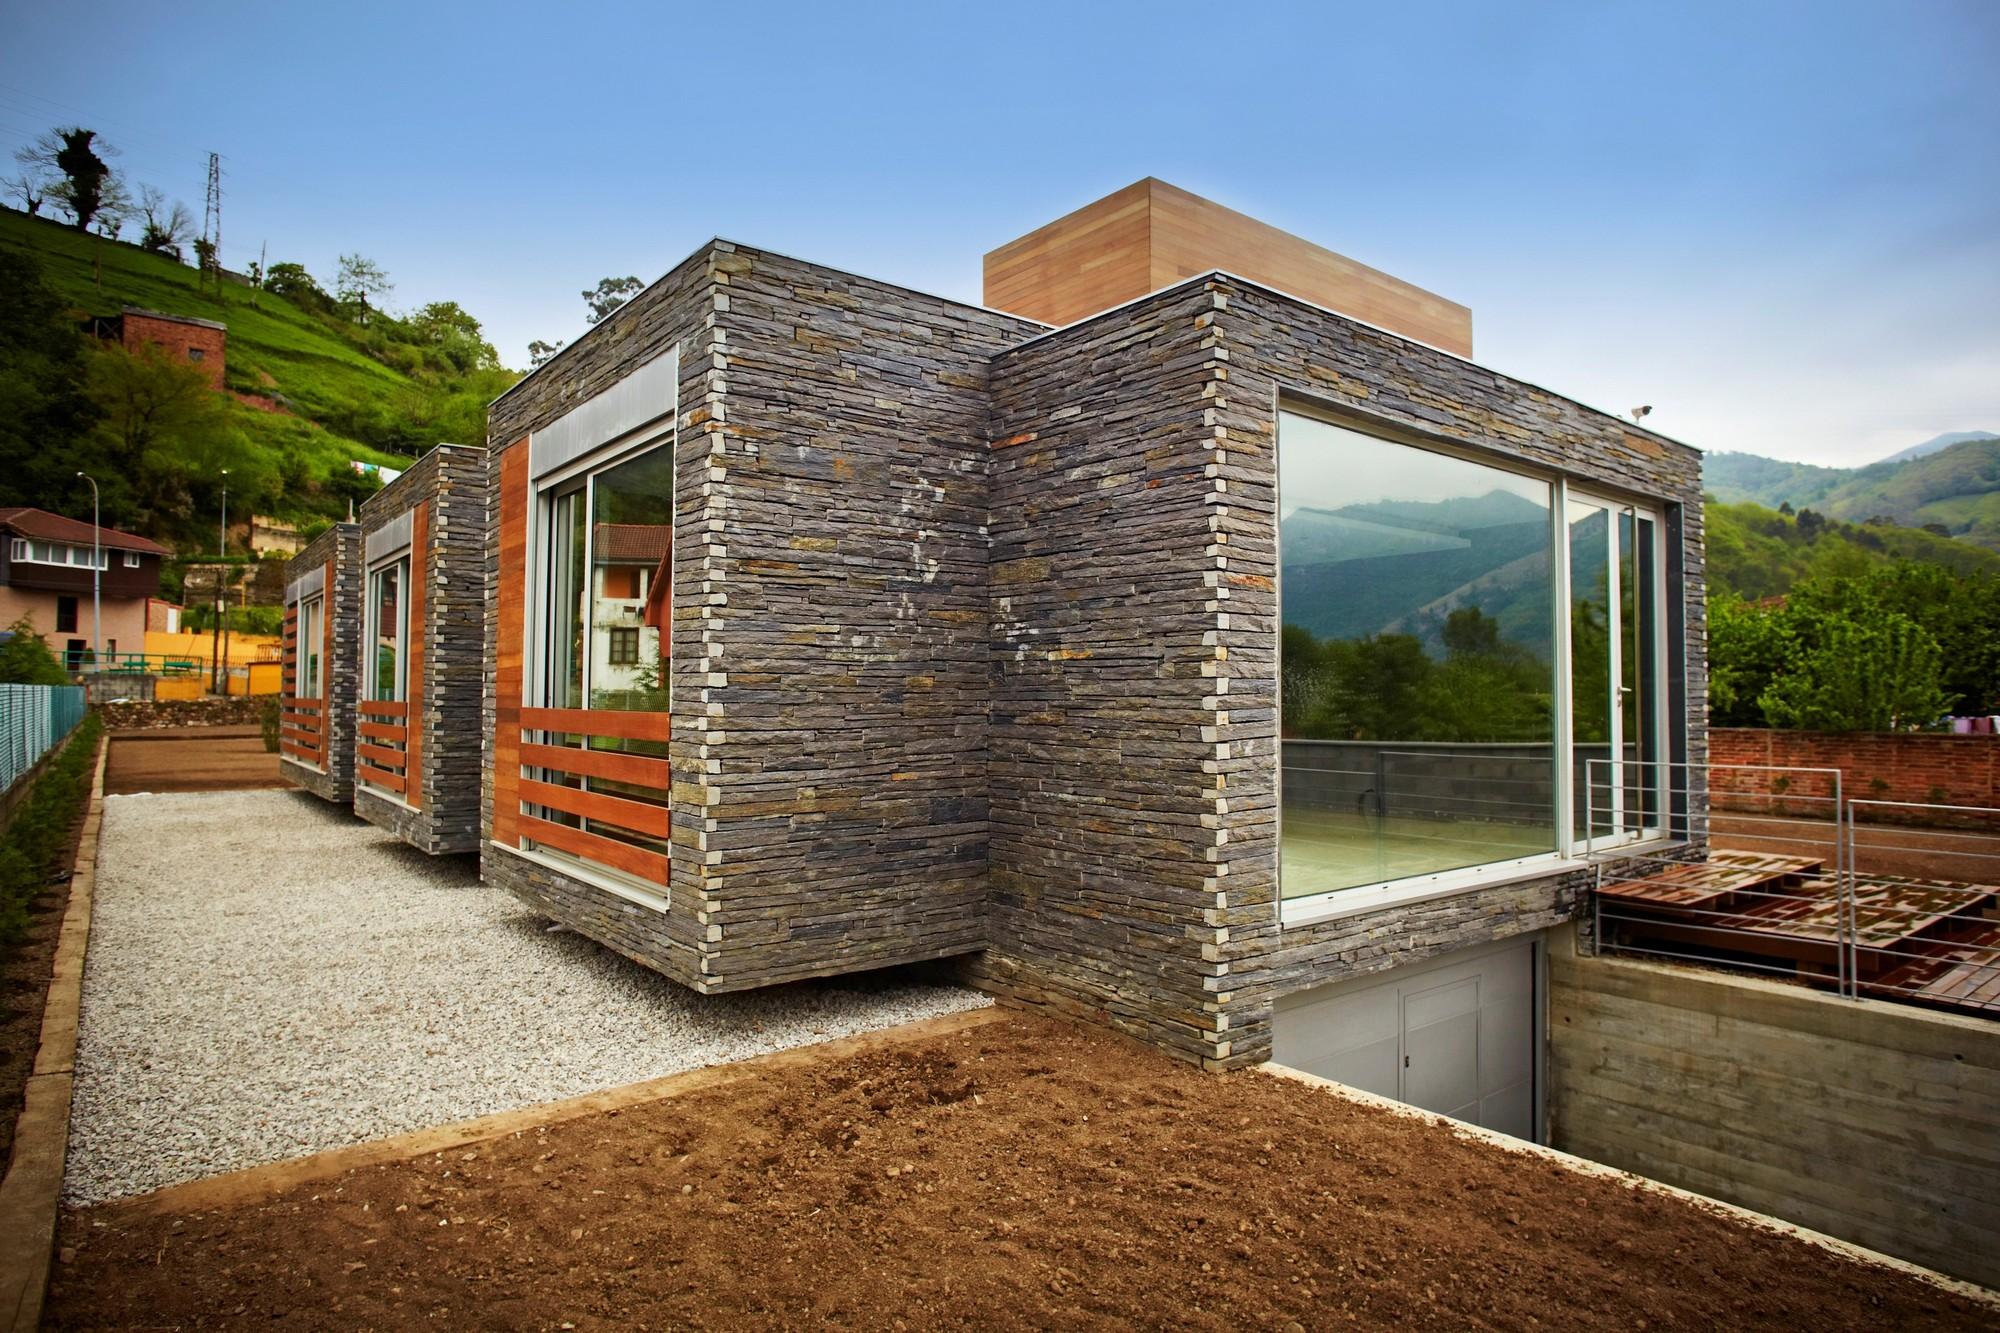 Gallery of family house in pereda zwei estudio creativo 6 - Precios de casas prefabricadas de hormigon en espana ...